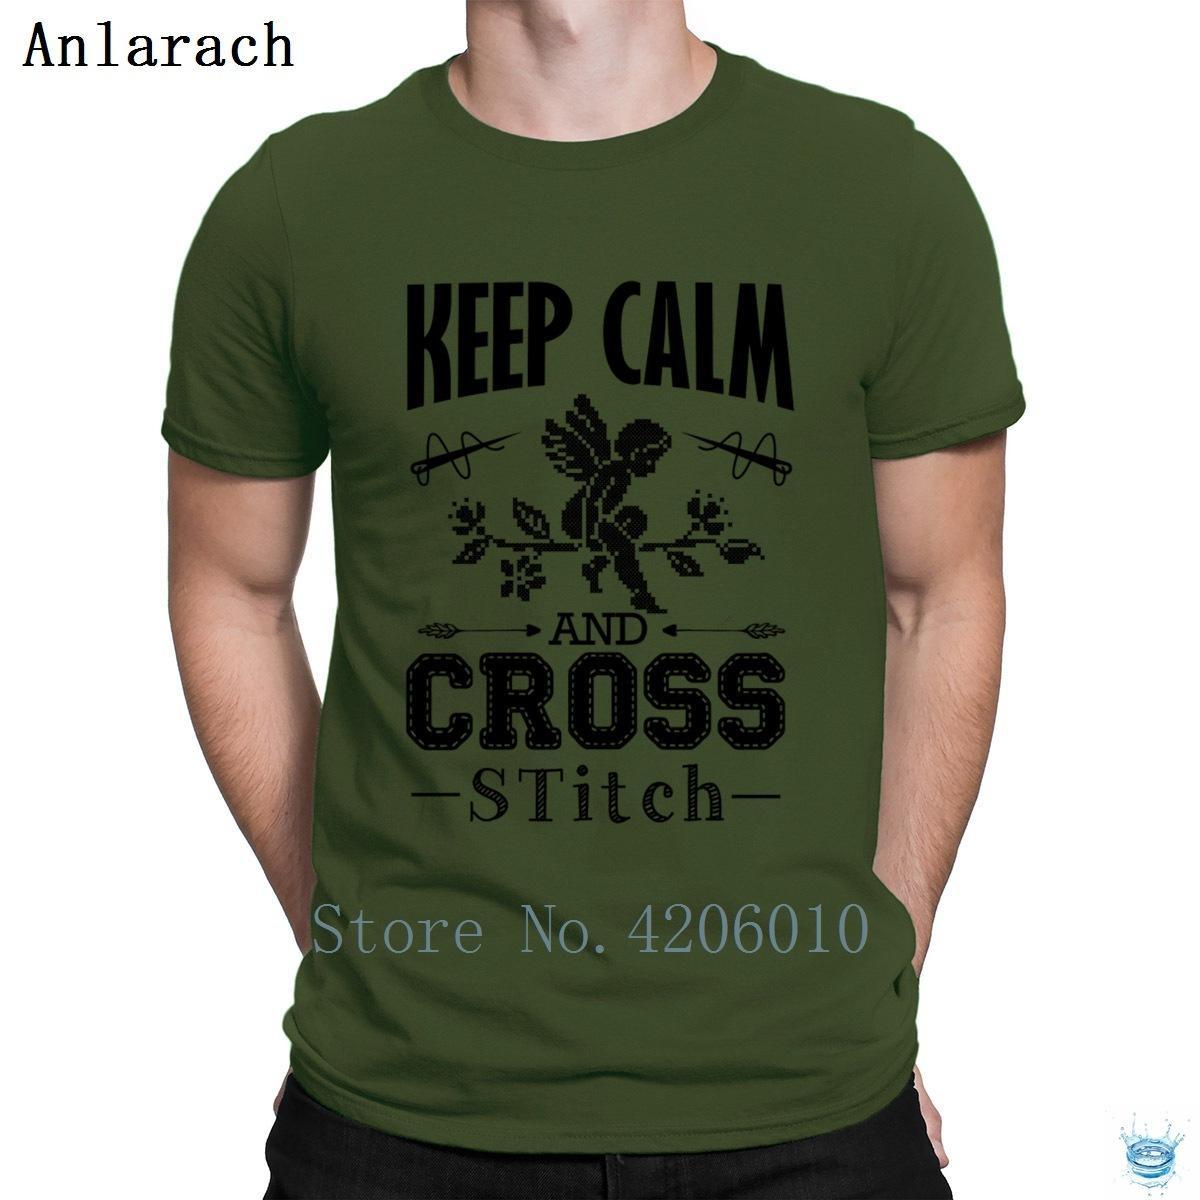 Keep Calm T Shirt Maker Bcd Tofu House